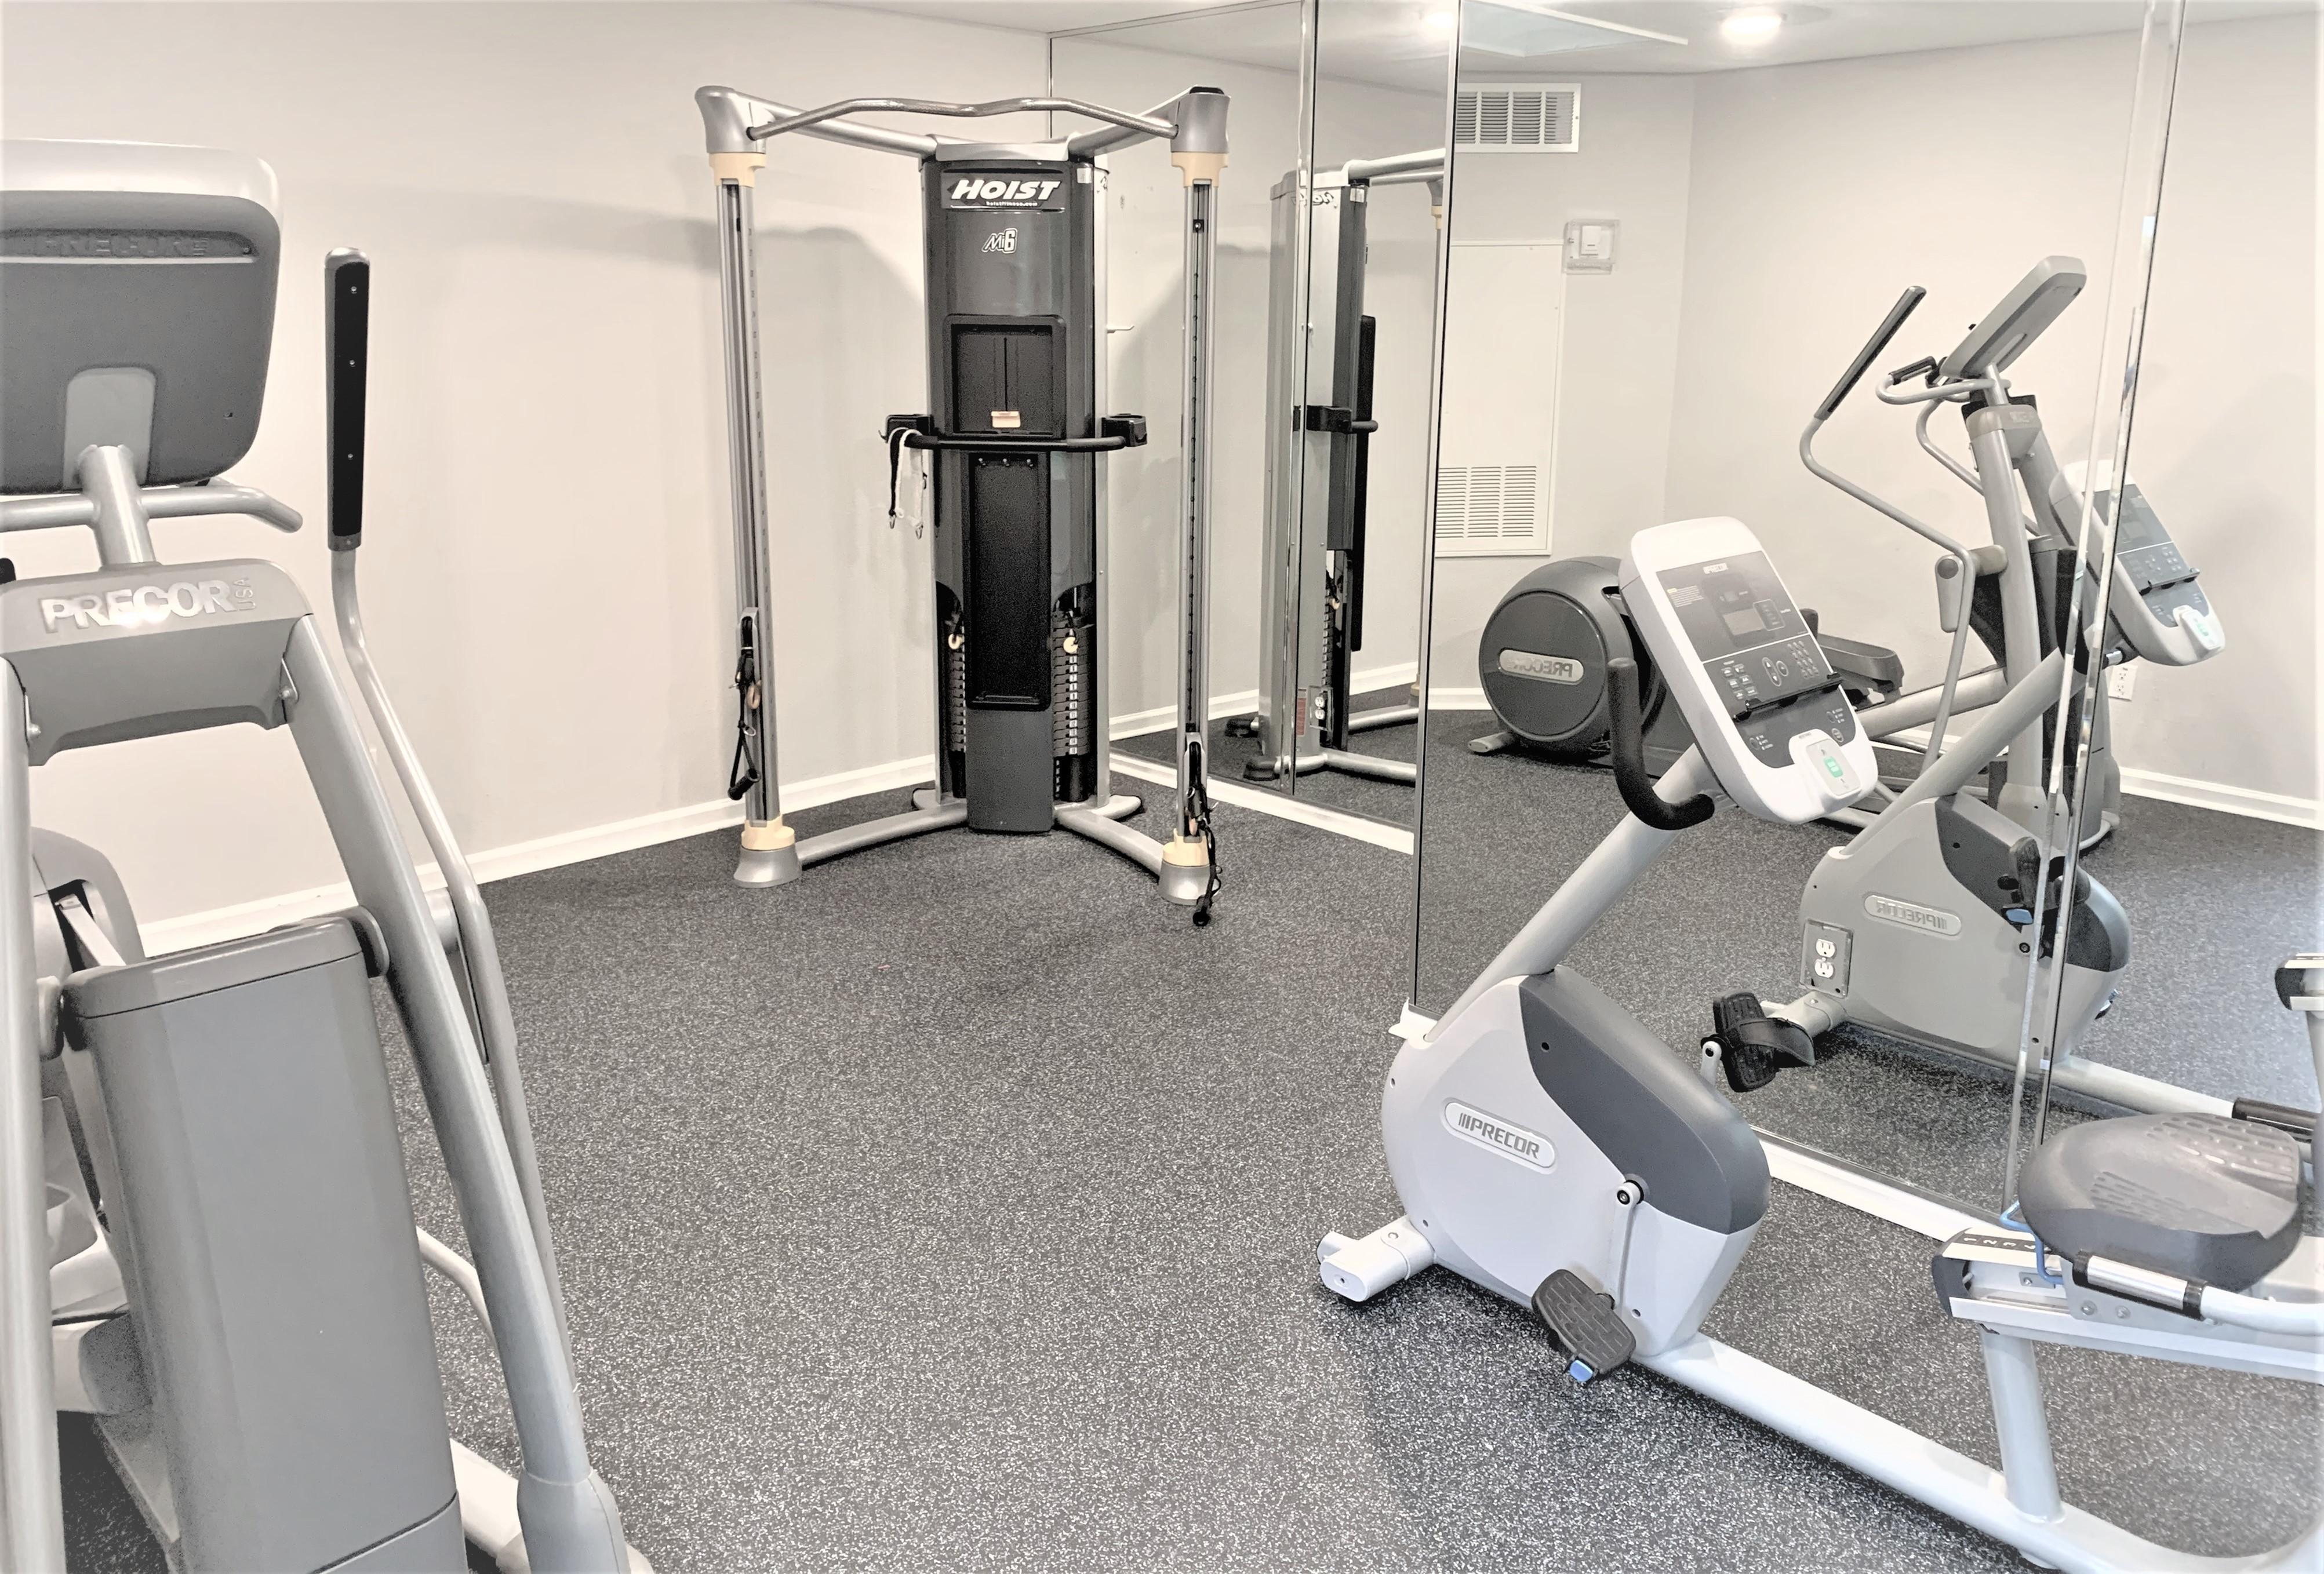 Fitness Center | Cardio Equipment | Weight Machine | Centennial Place Apartments